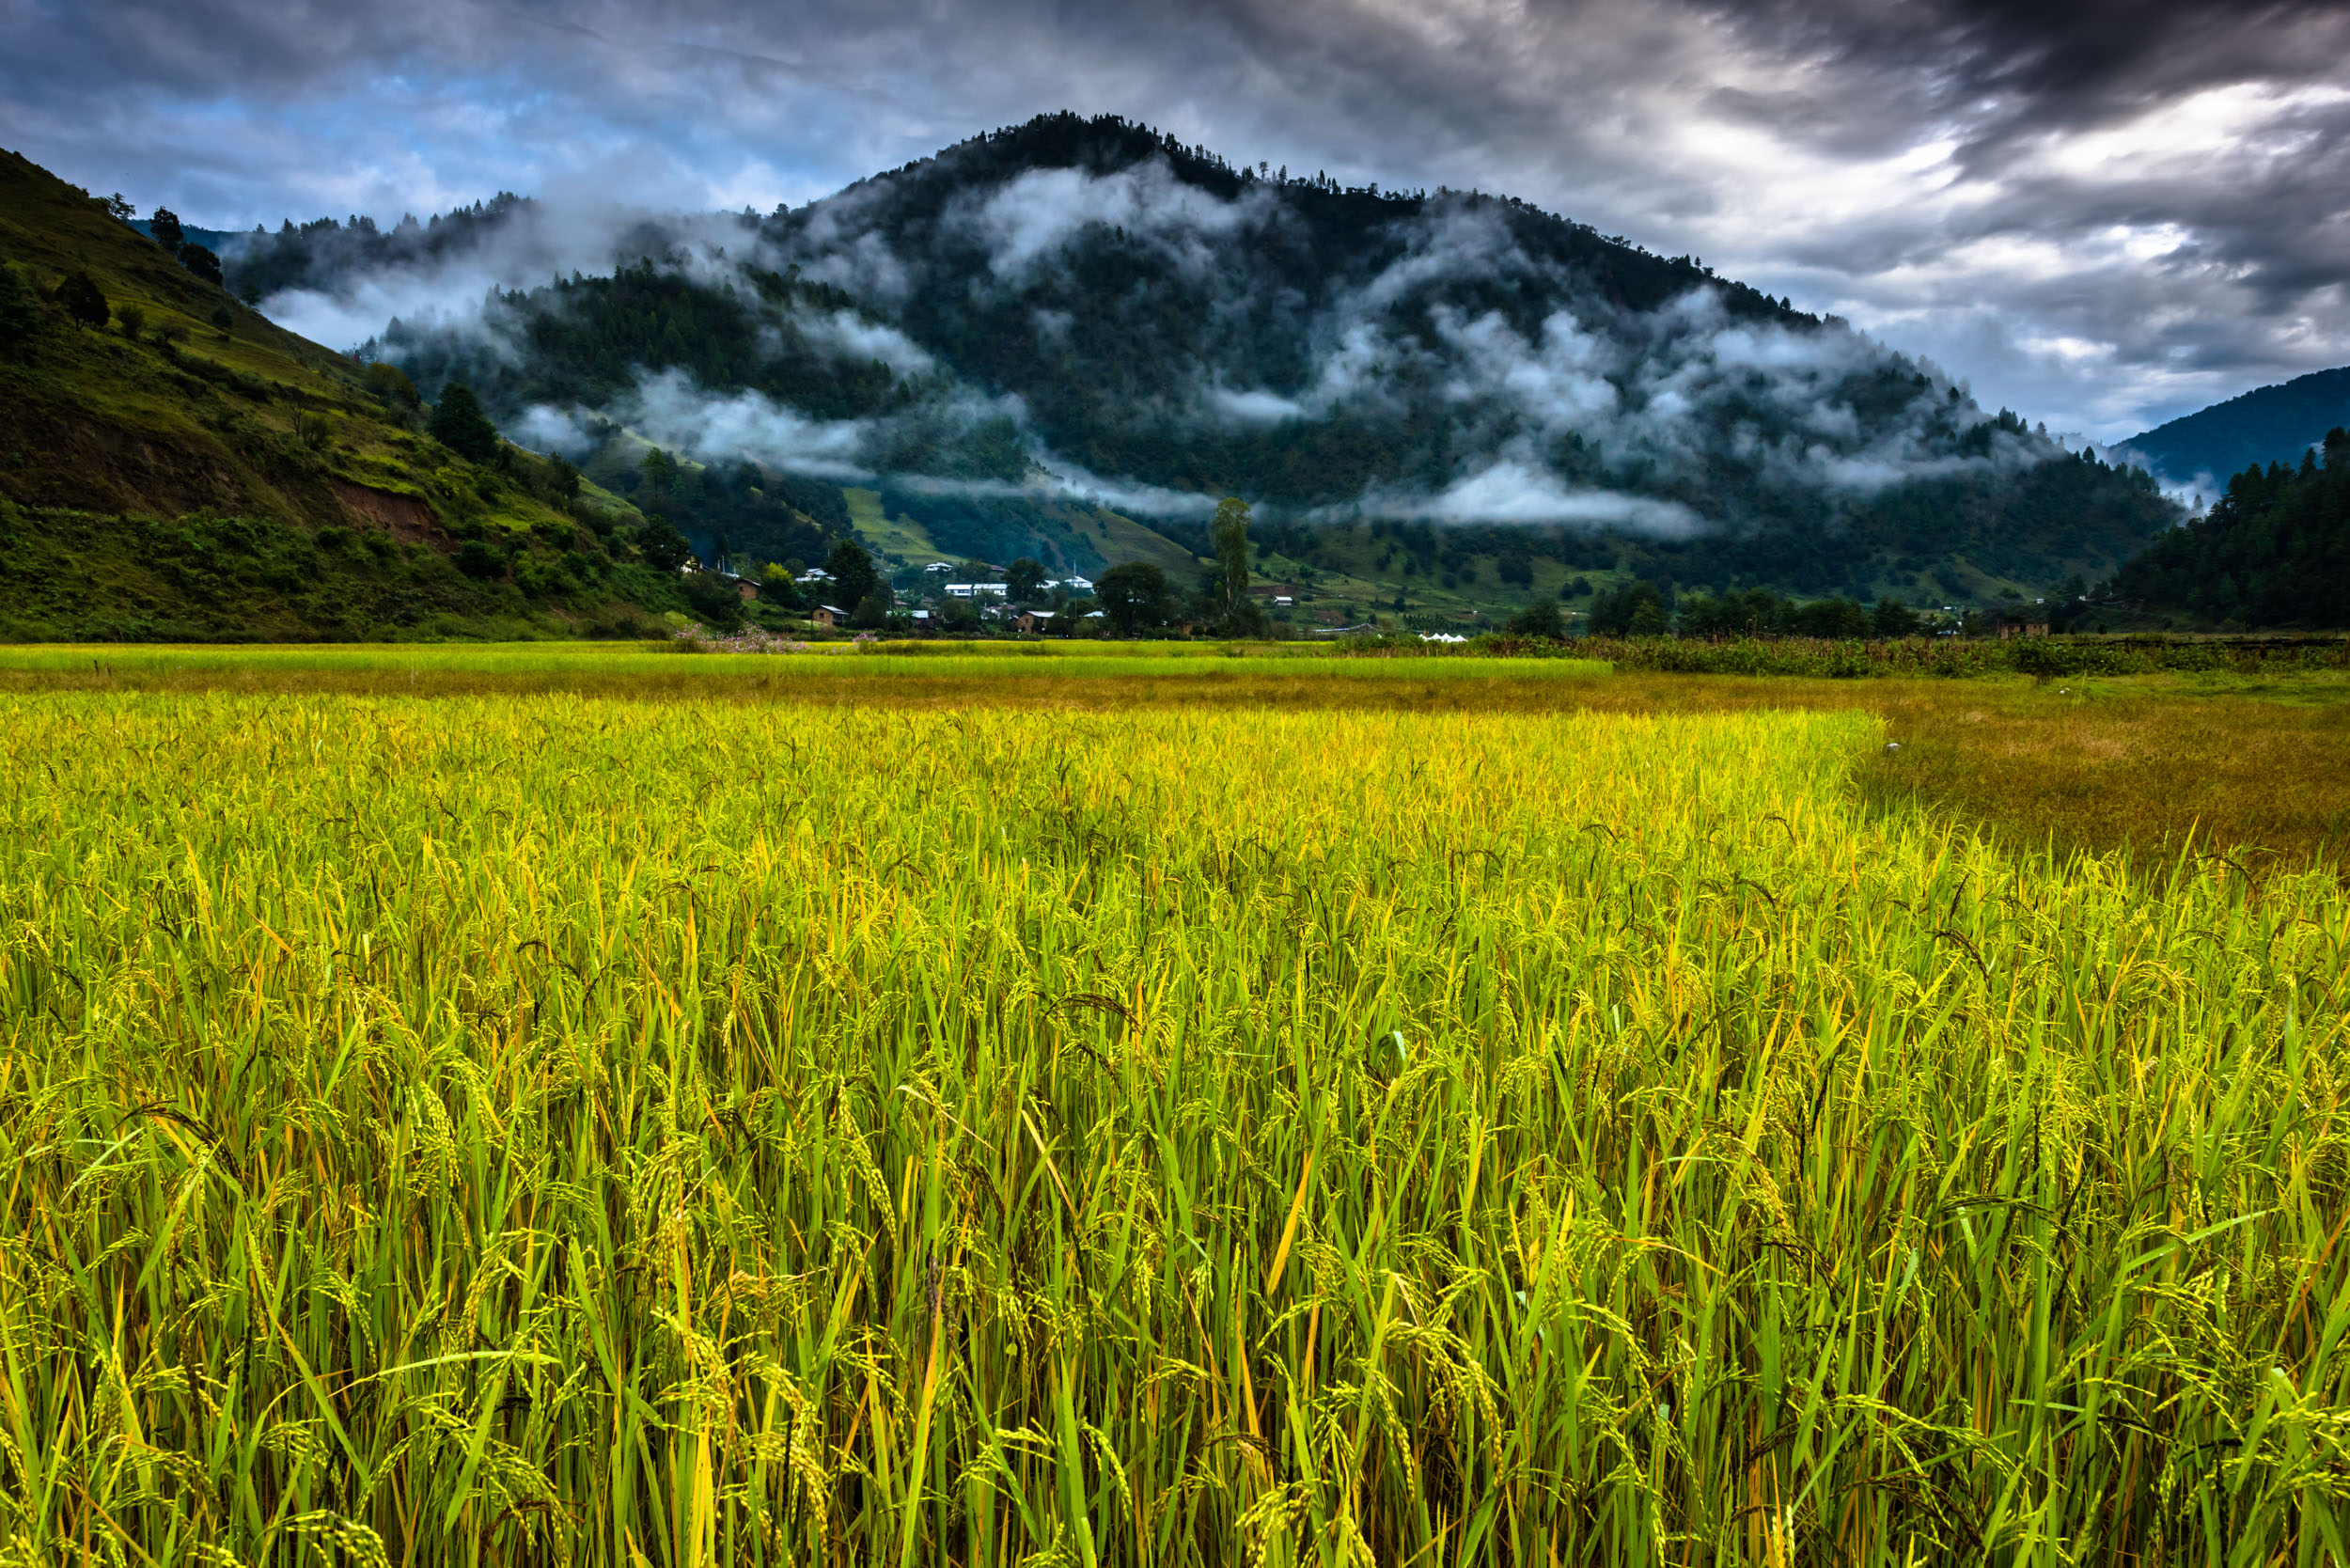 Paddy fields in Sangti Valley